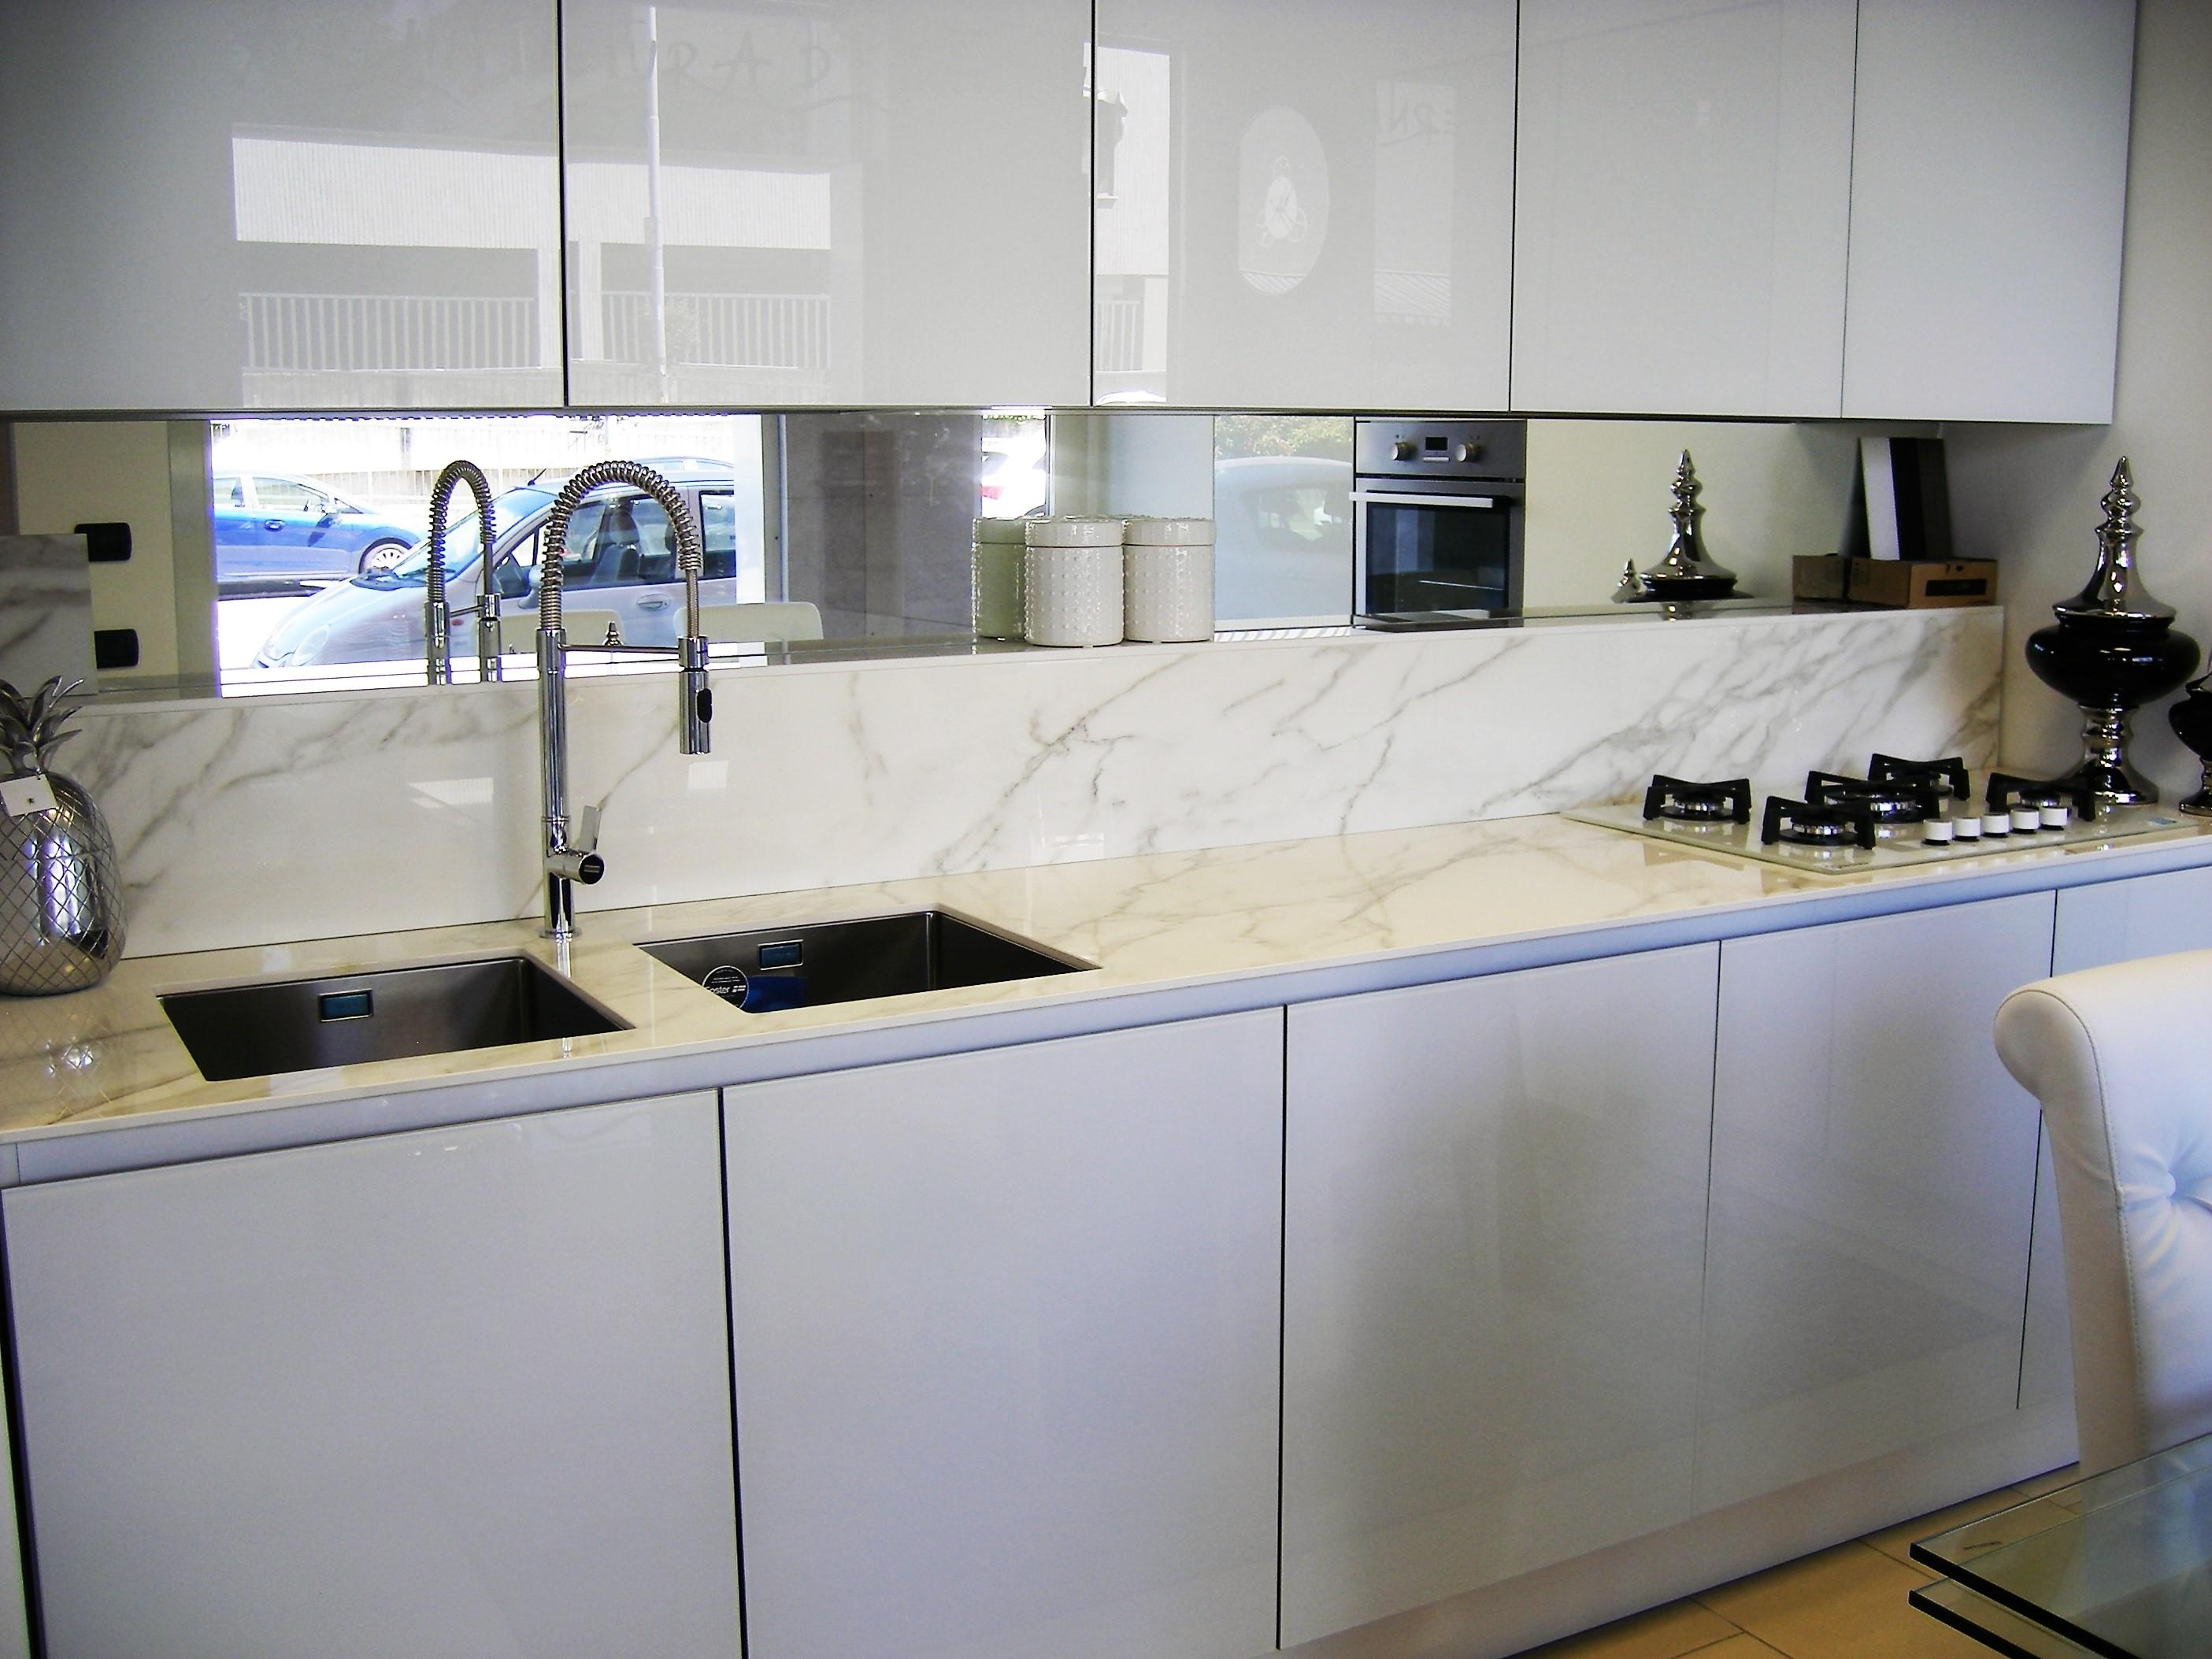 cucina-arredo3-glass-in-vetro-bianco-lucido-design-vetro-bianca_O10 ...